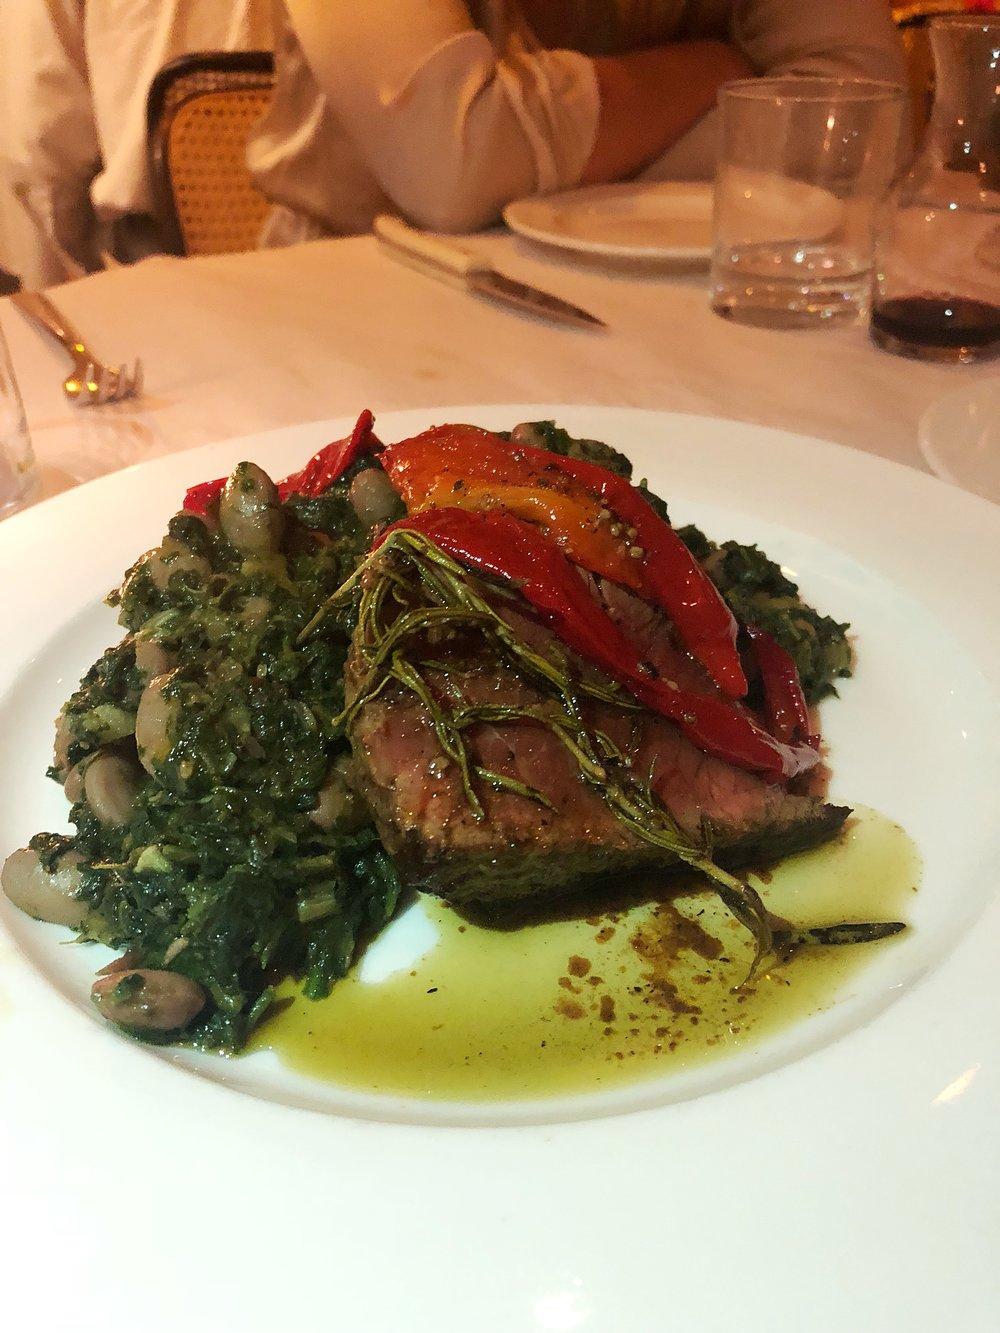 King_Sirloin Steak